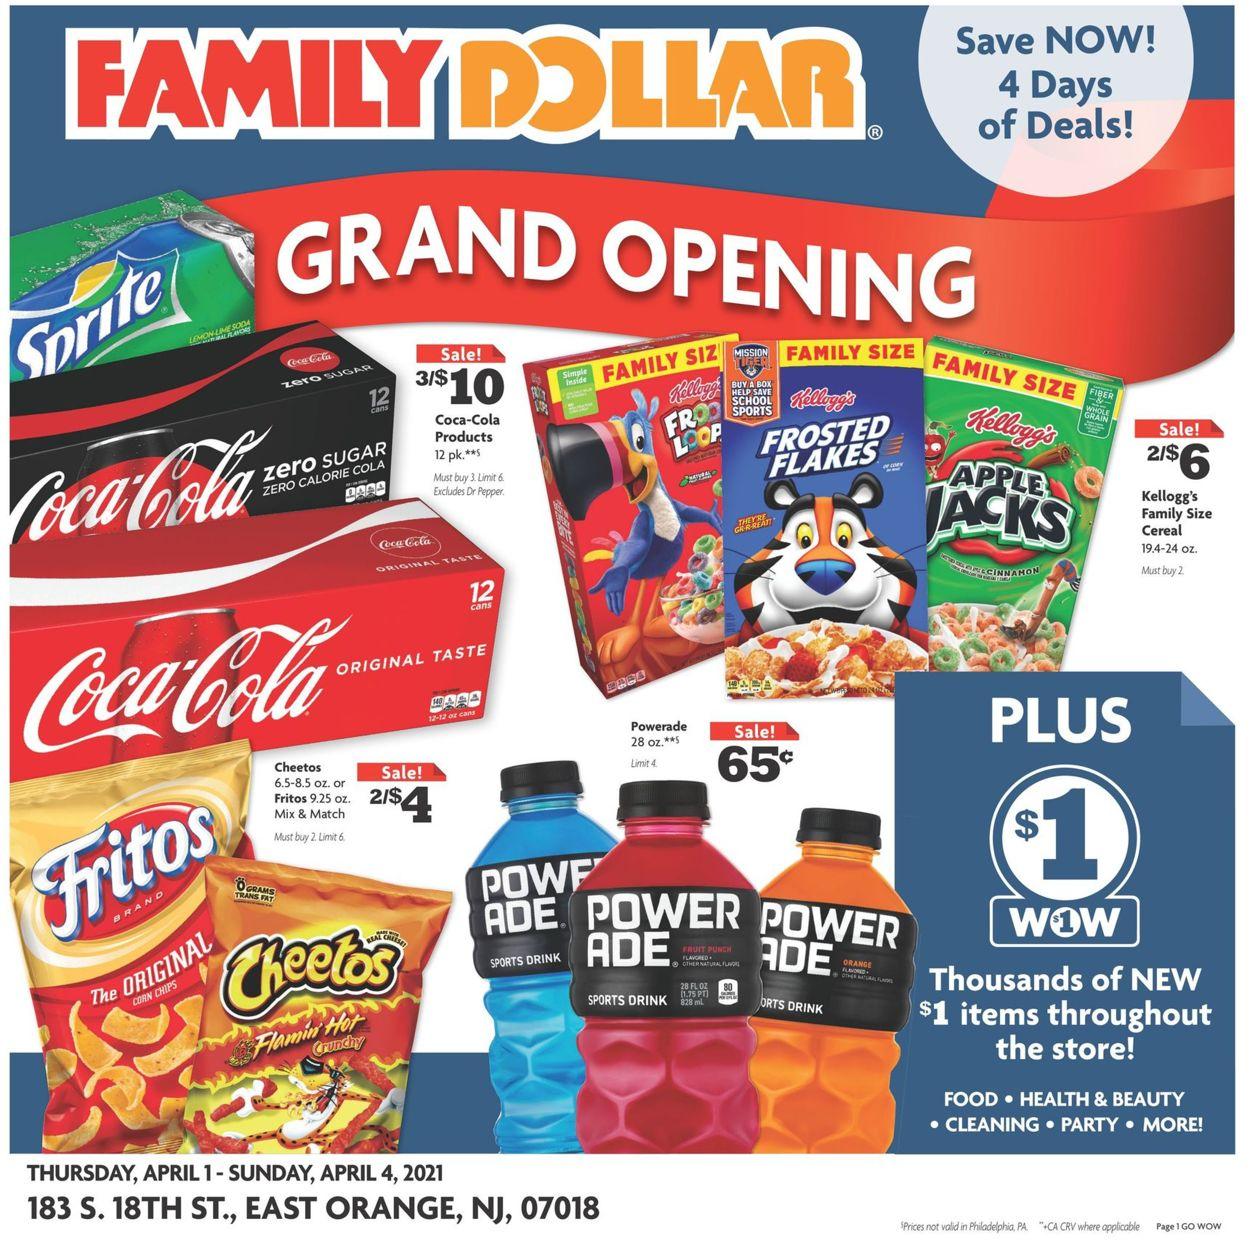 Family Dollar - Easter 2021 Weekly Ad Circular - valid 04/01-04/04/2021